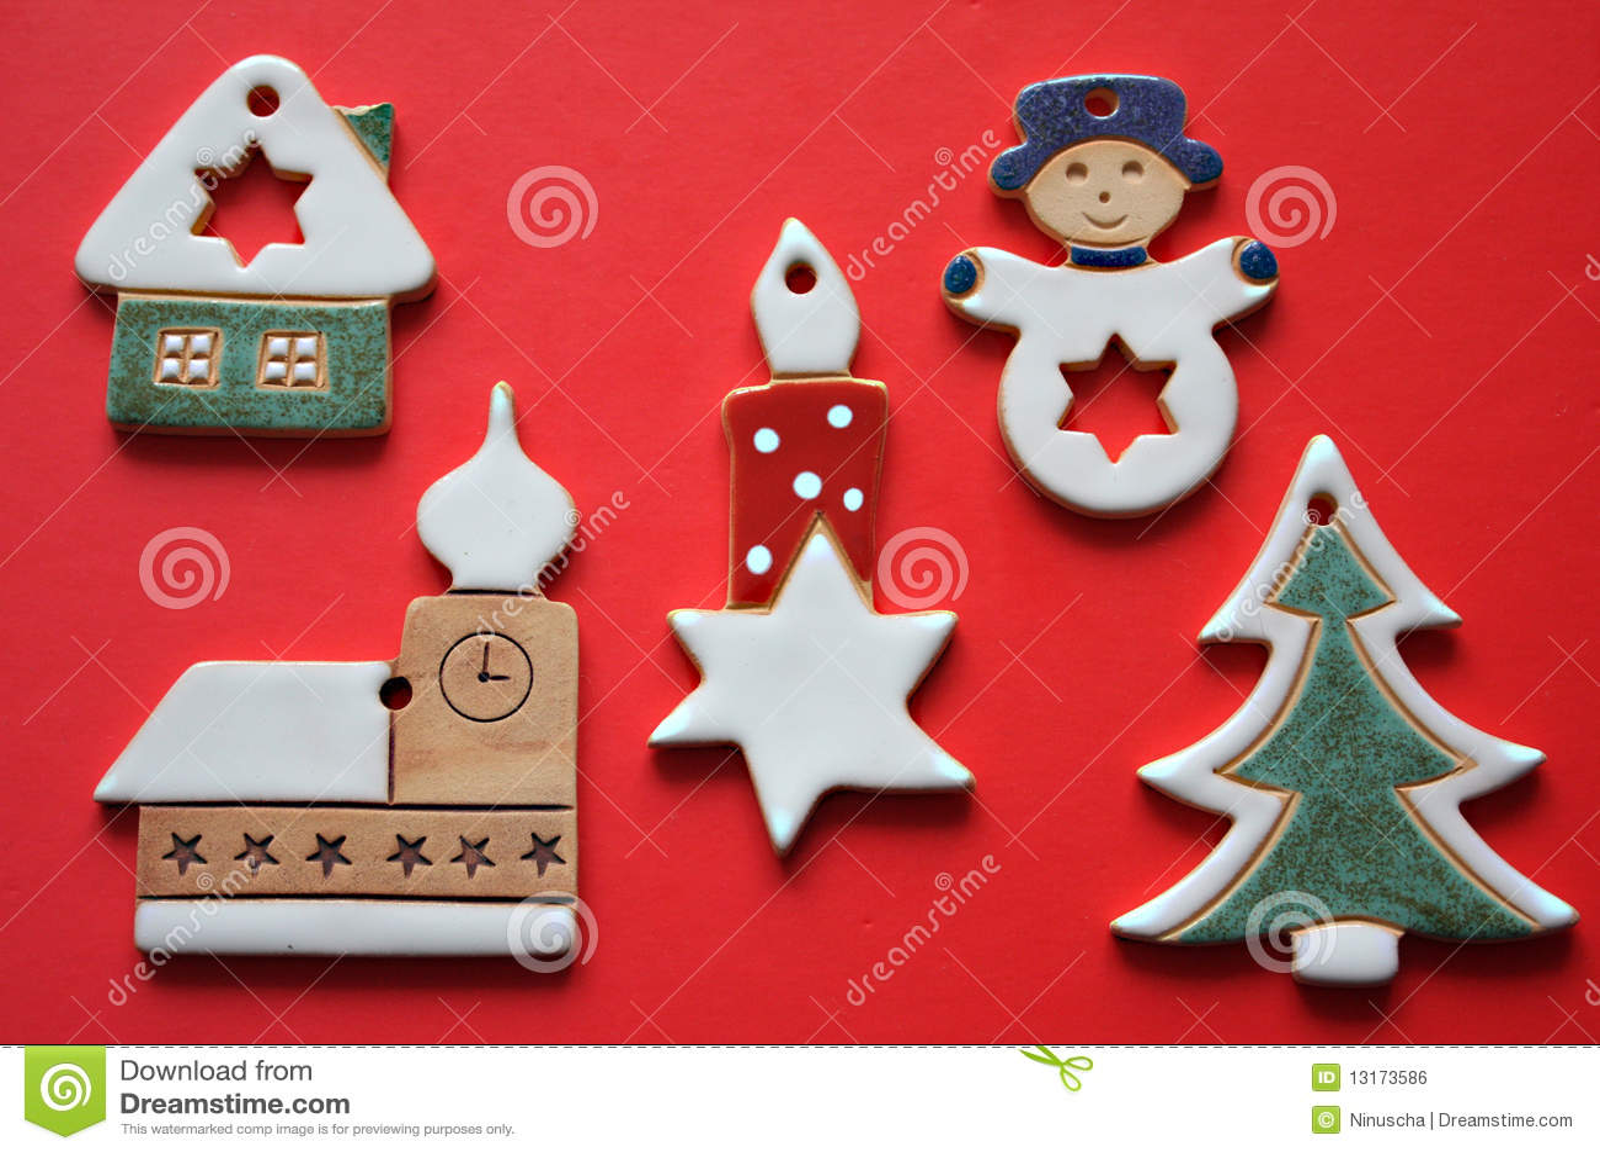 Retro Ceramic Christmas Decorations Royalty Free Stock